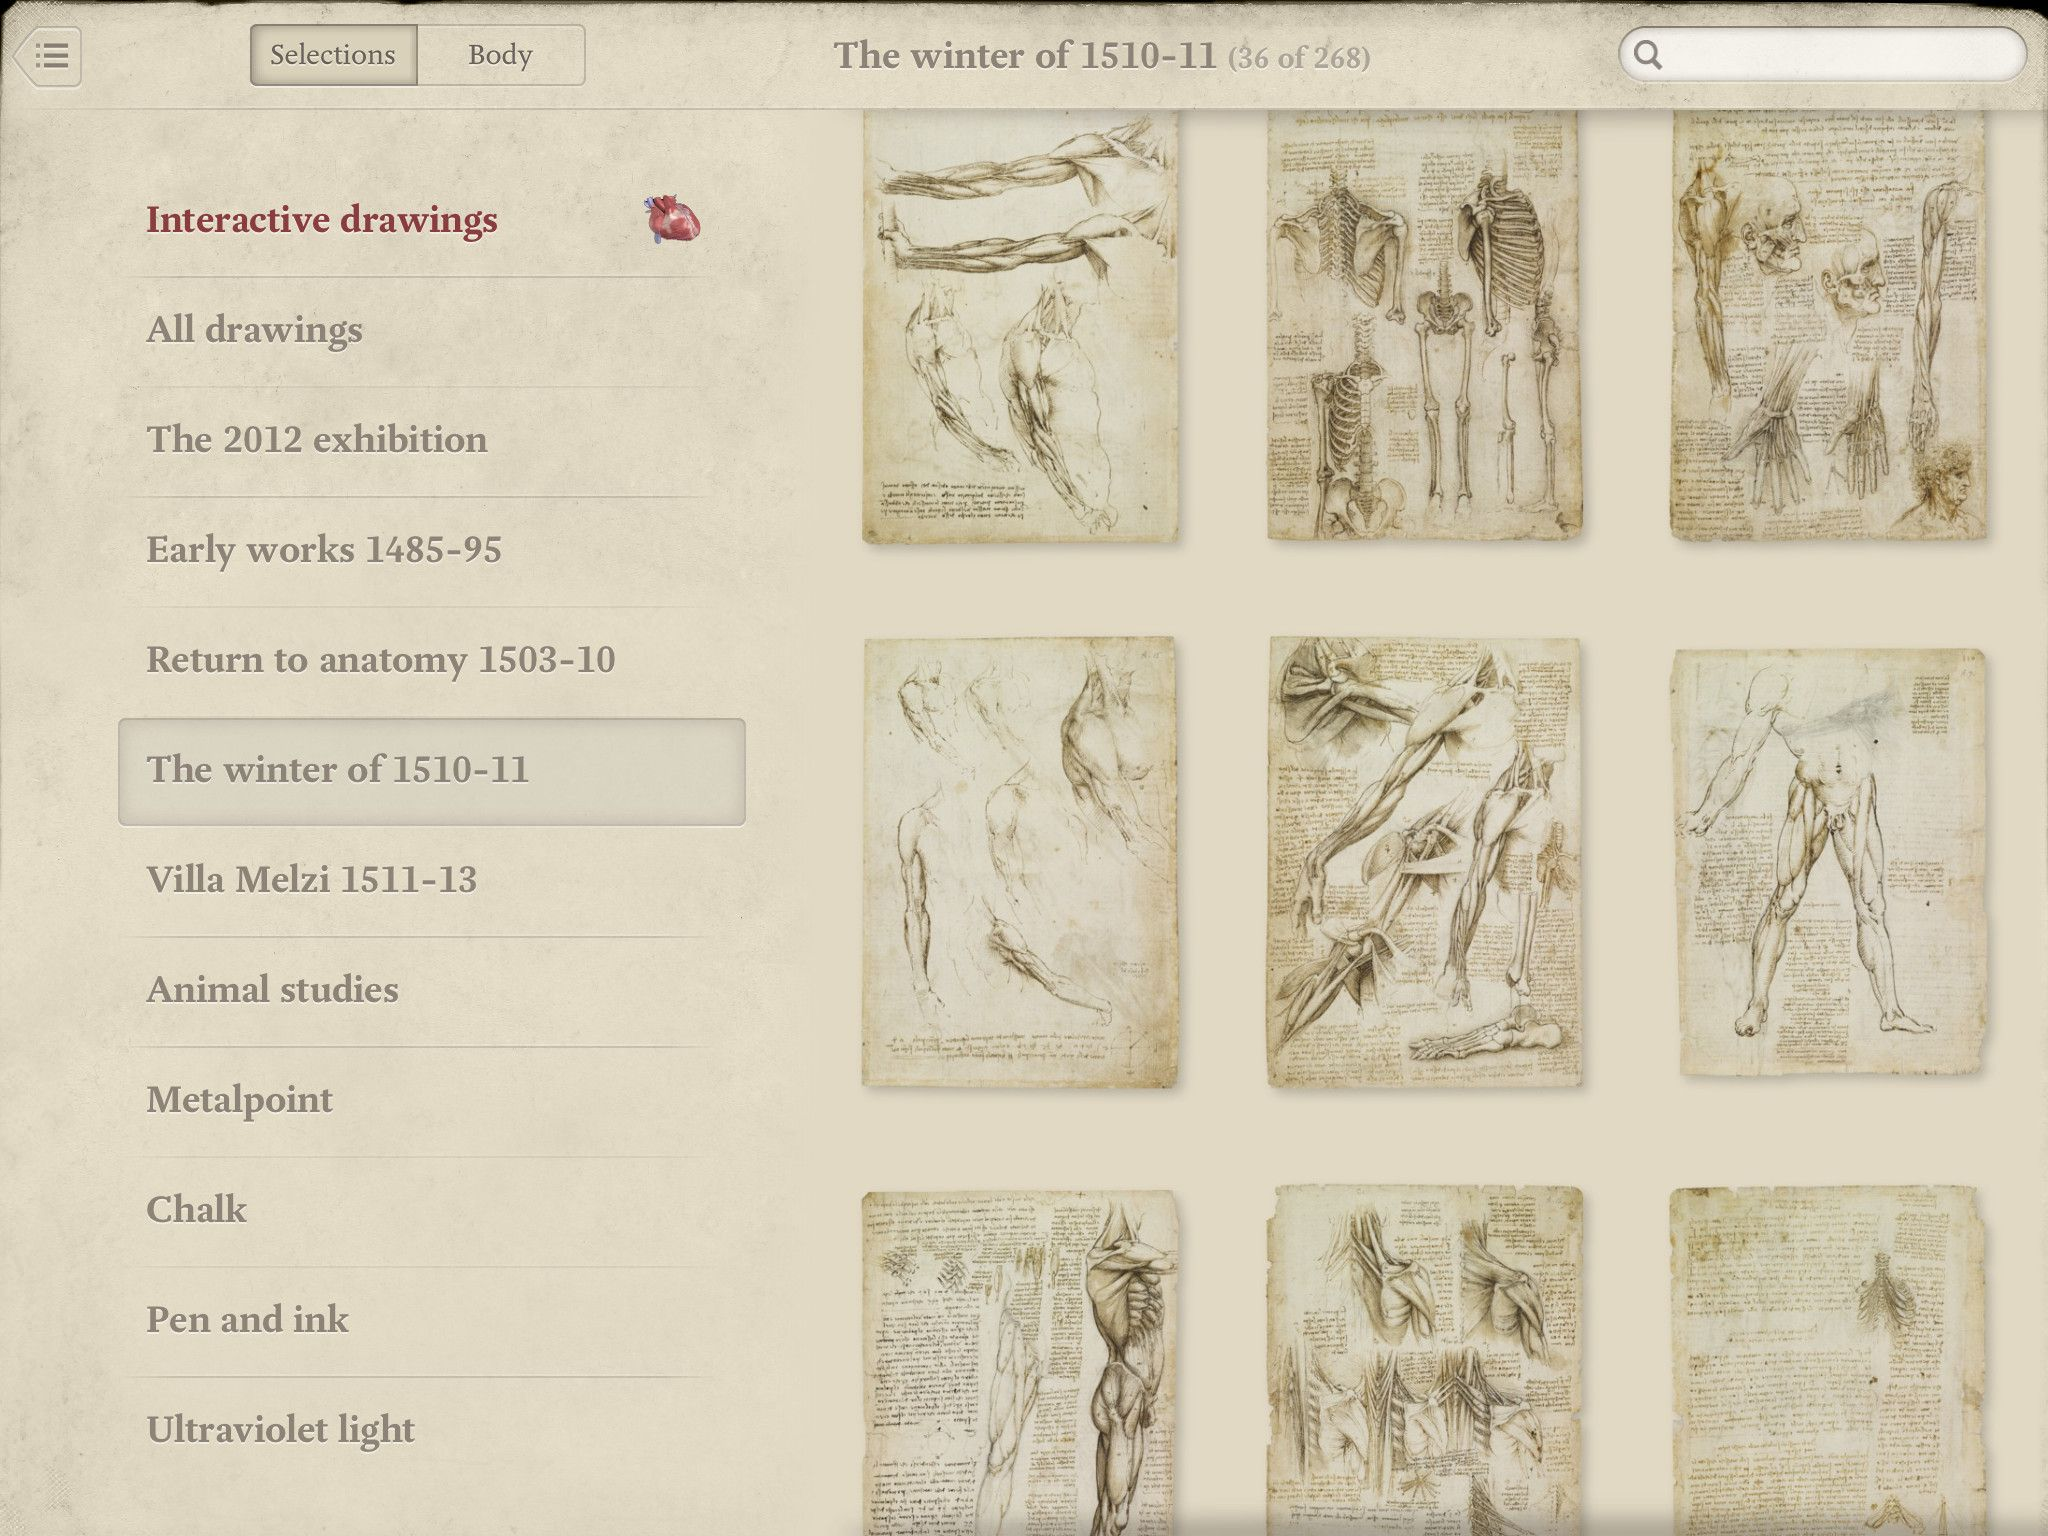 Leonardo da Vinci Anatomy For iPad The Master's work